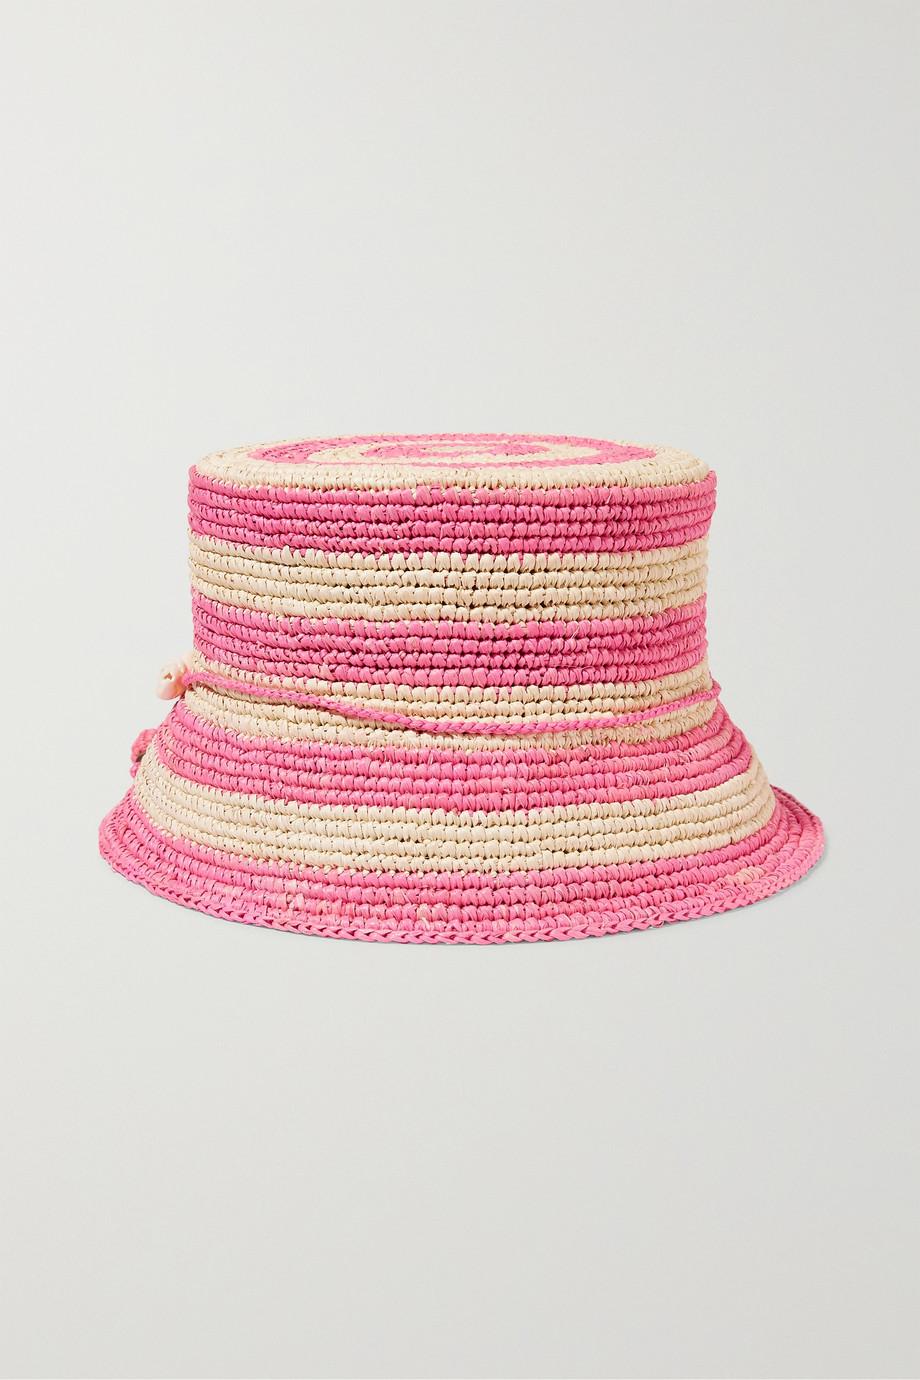 Sensi Studio Kids Embellished striped toquilla straw bucket hat